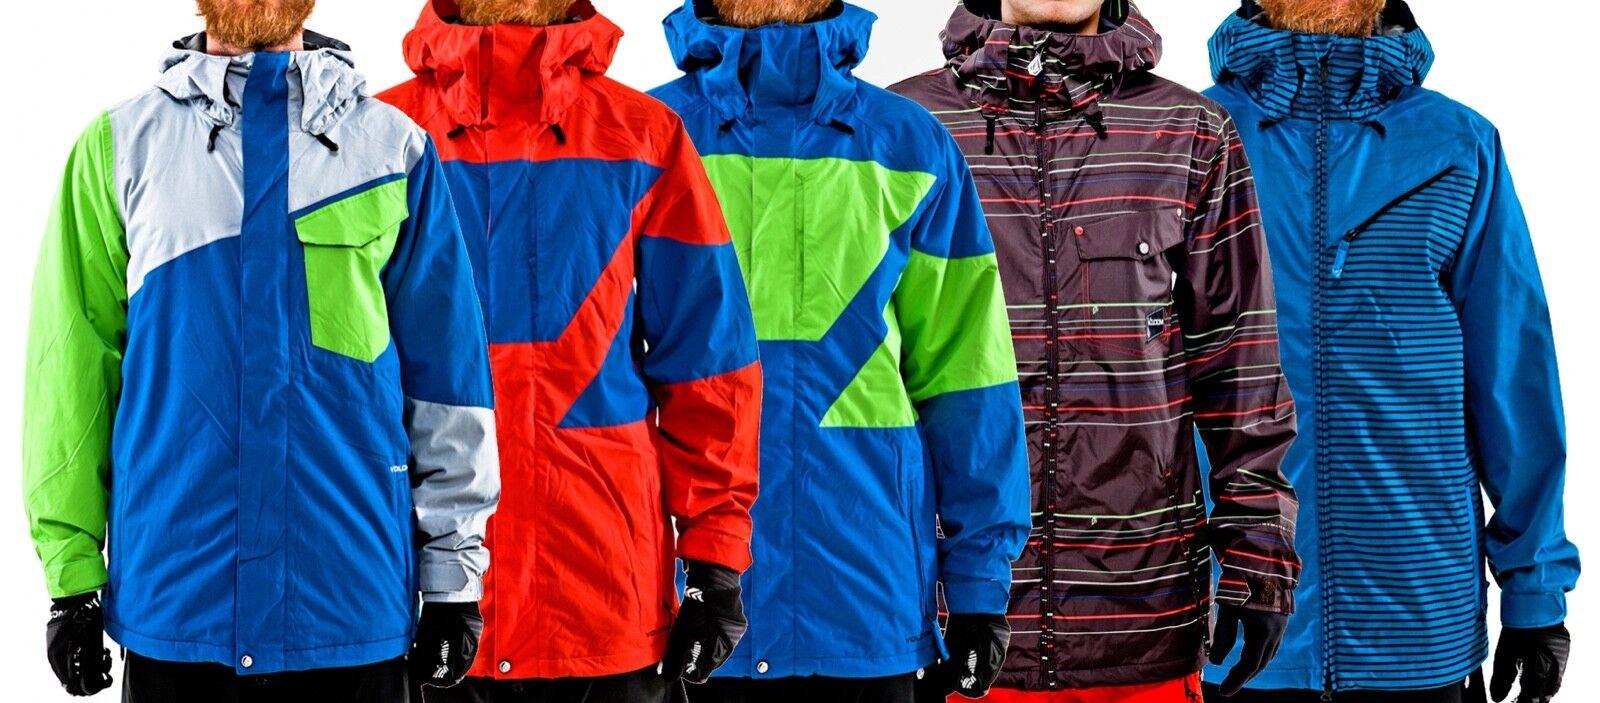 Volcom Snowboard Jacket Snowboardjacke Winter Ski Jacke Skijacken